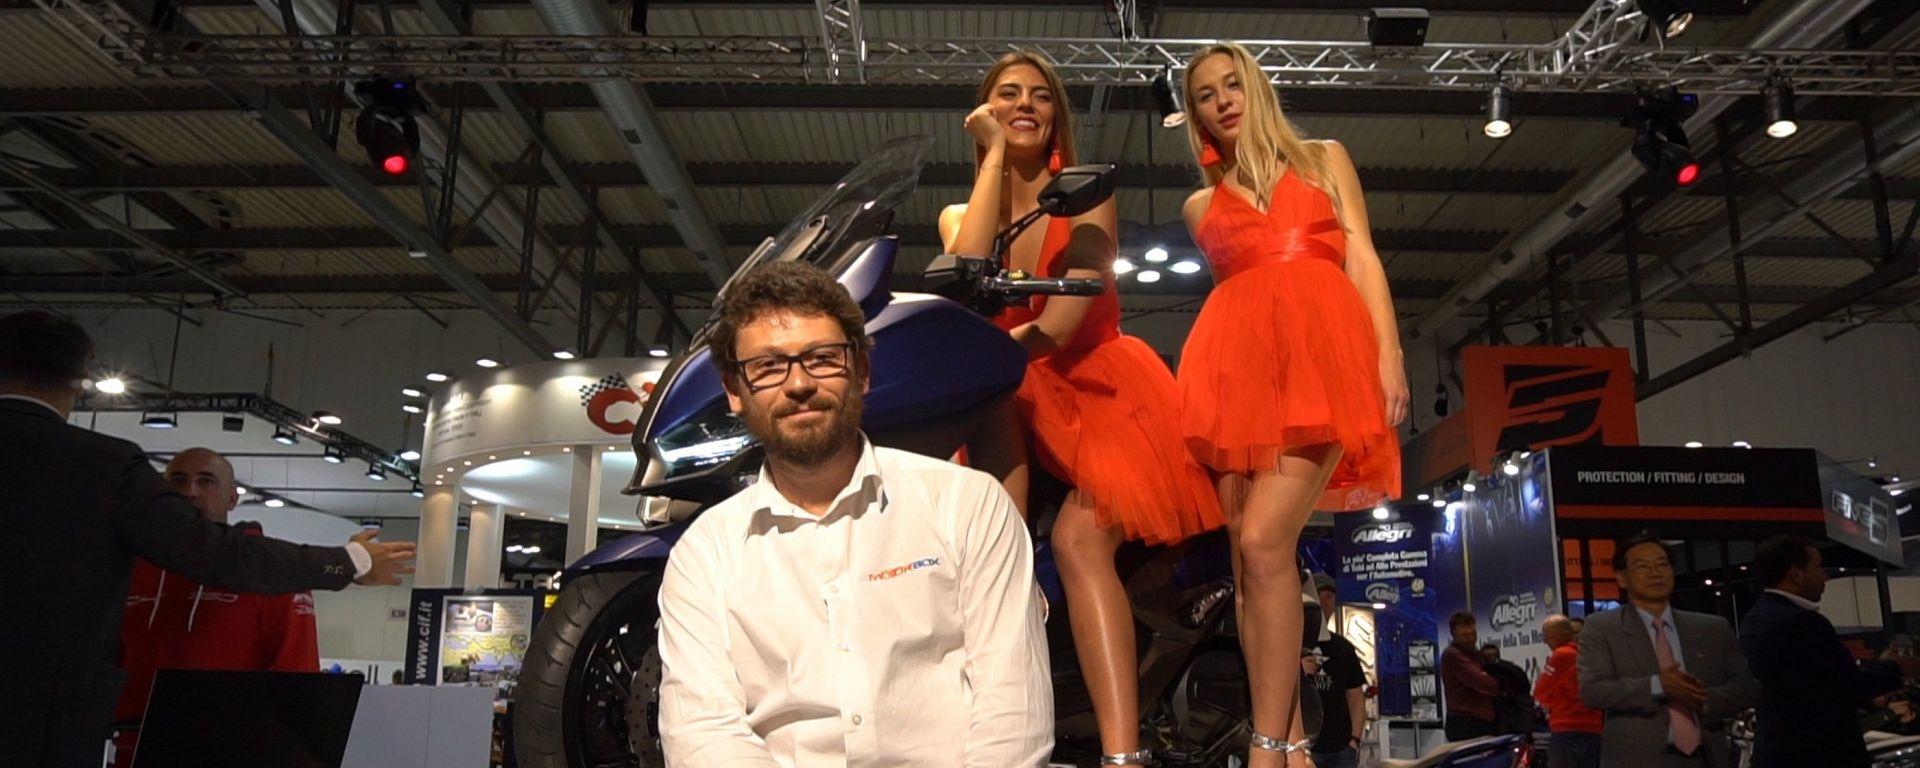 Kymco Xciting S 400, più design, più funzionalità [VIDEO]